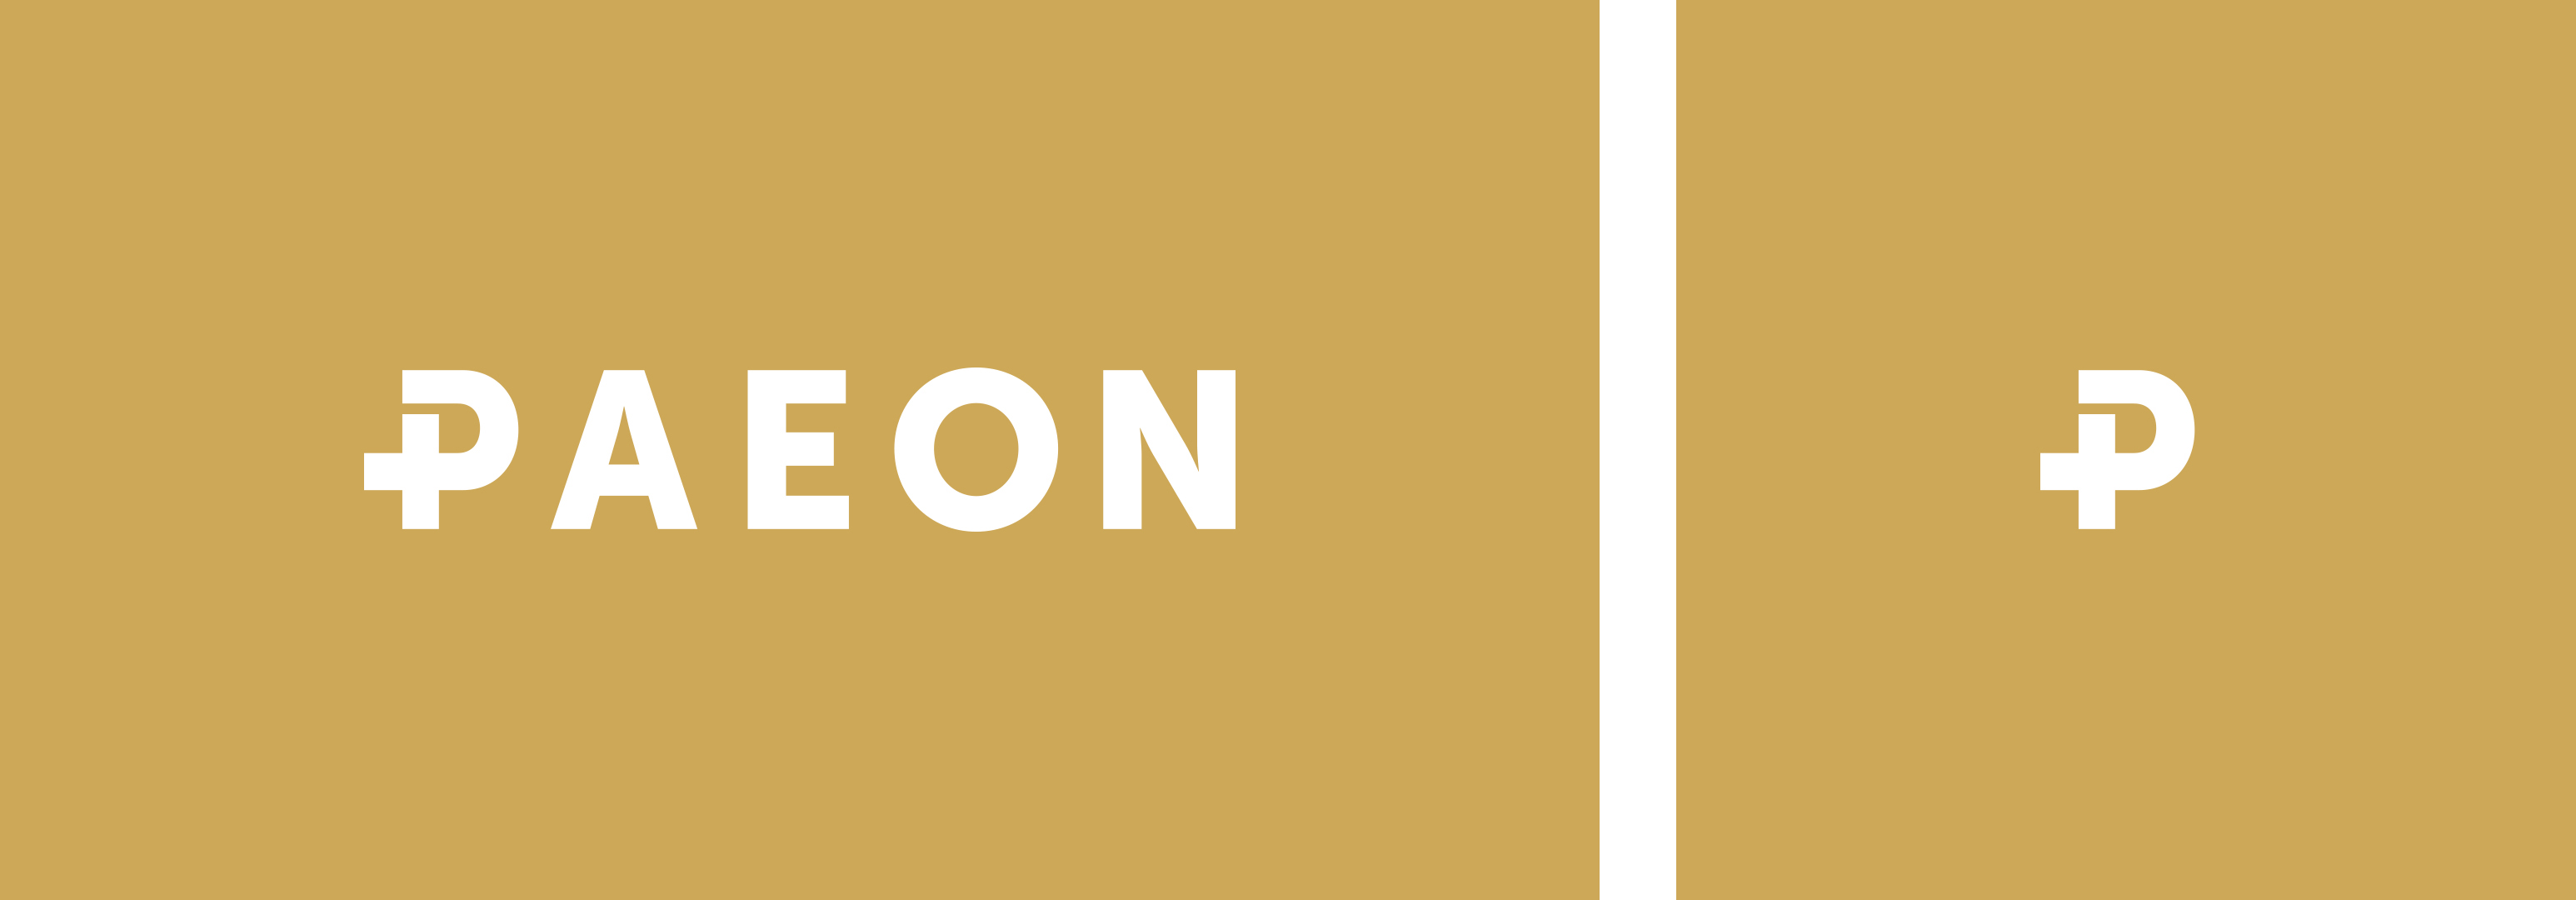 paeon_logo_favicon